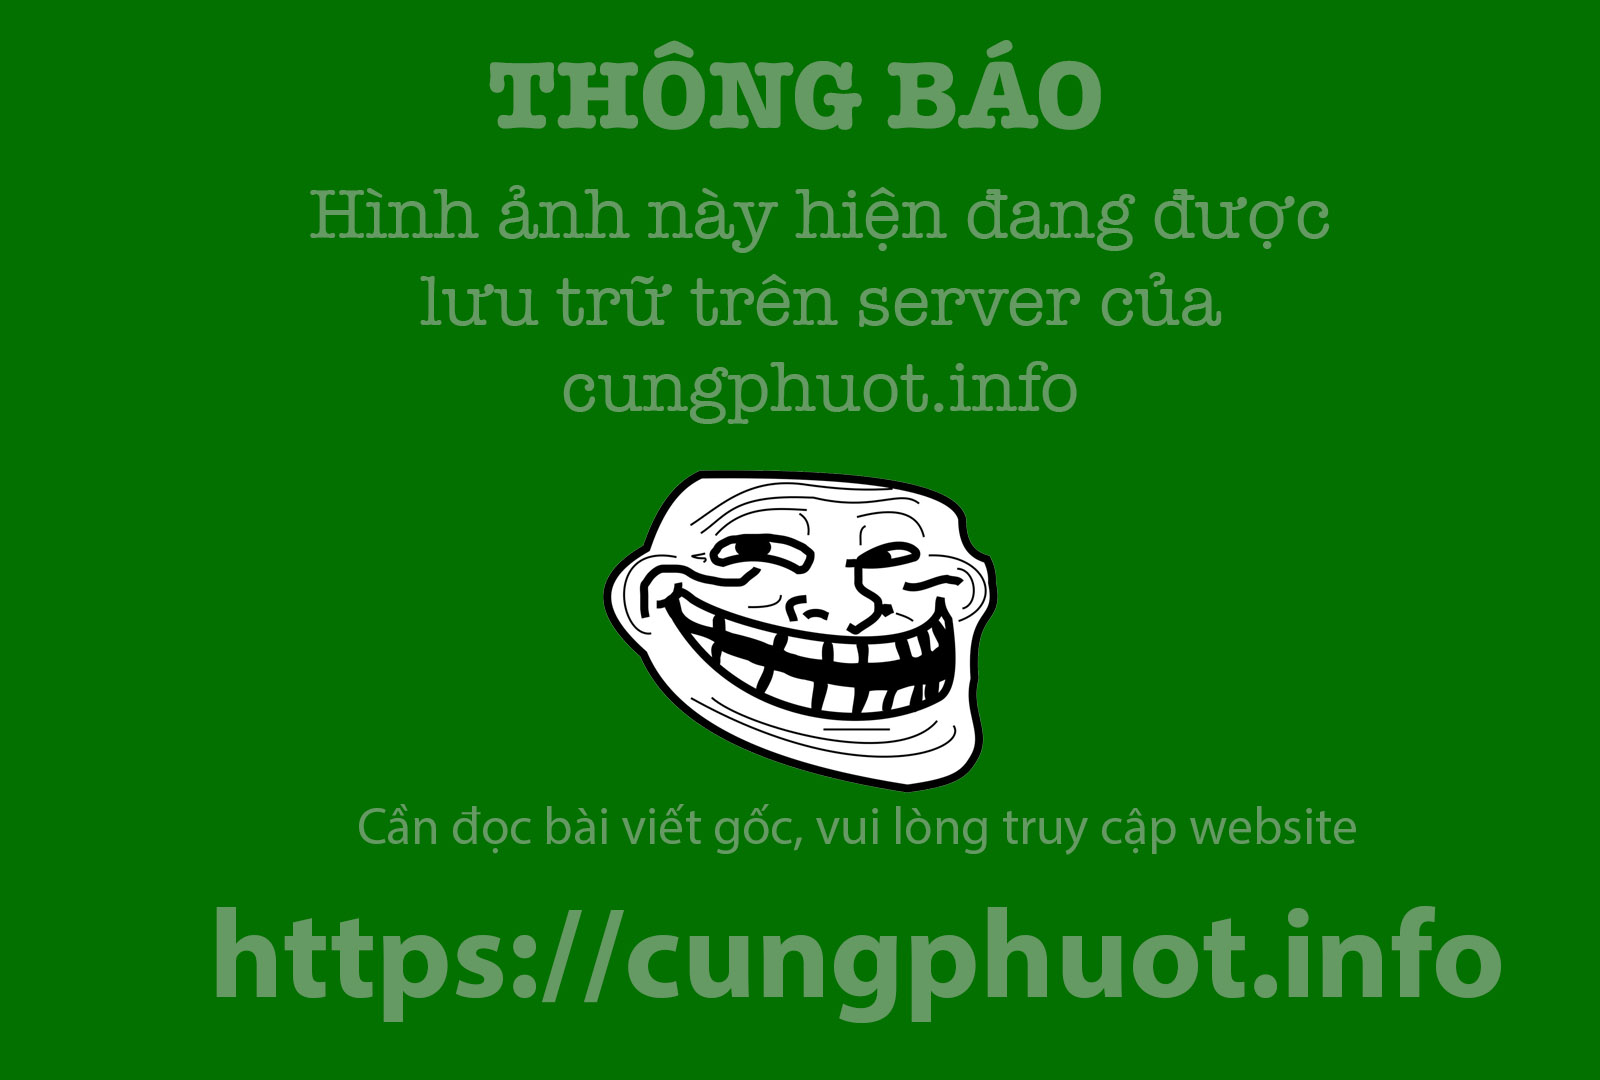 Chon bien cuong 'troi thap, dat cao' o Nam Can hinh anh 8